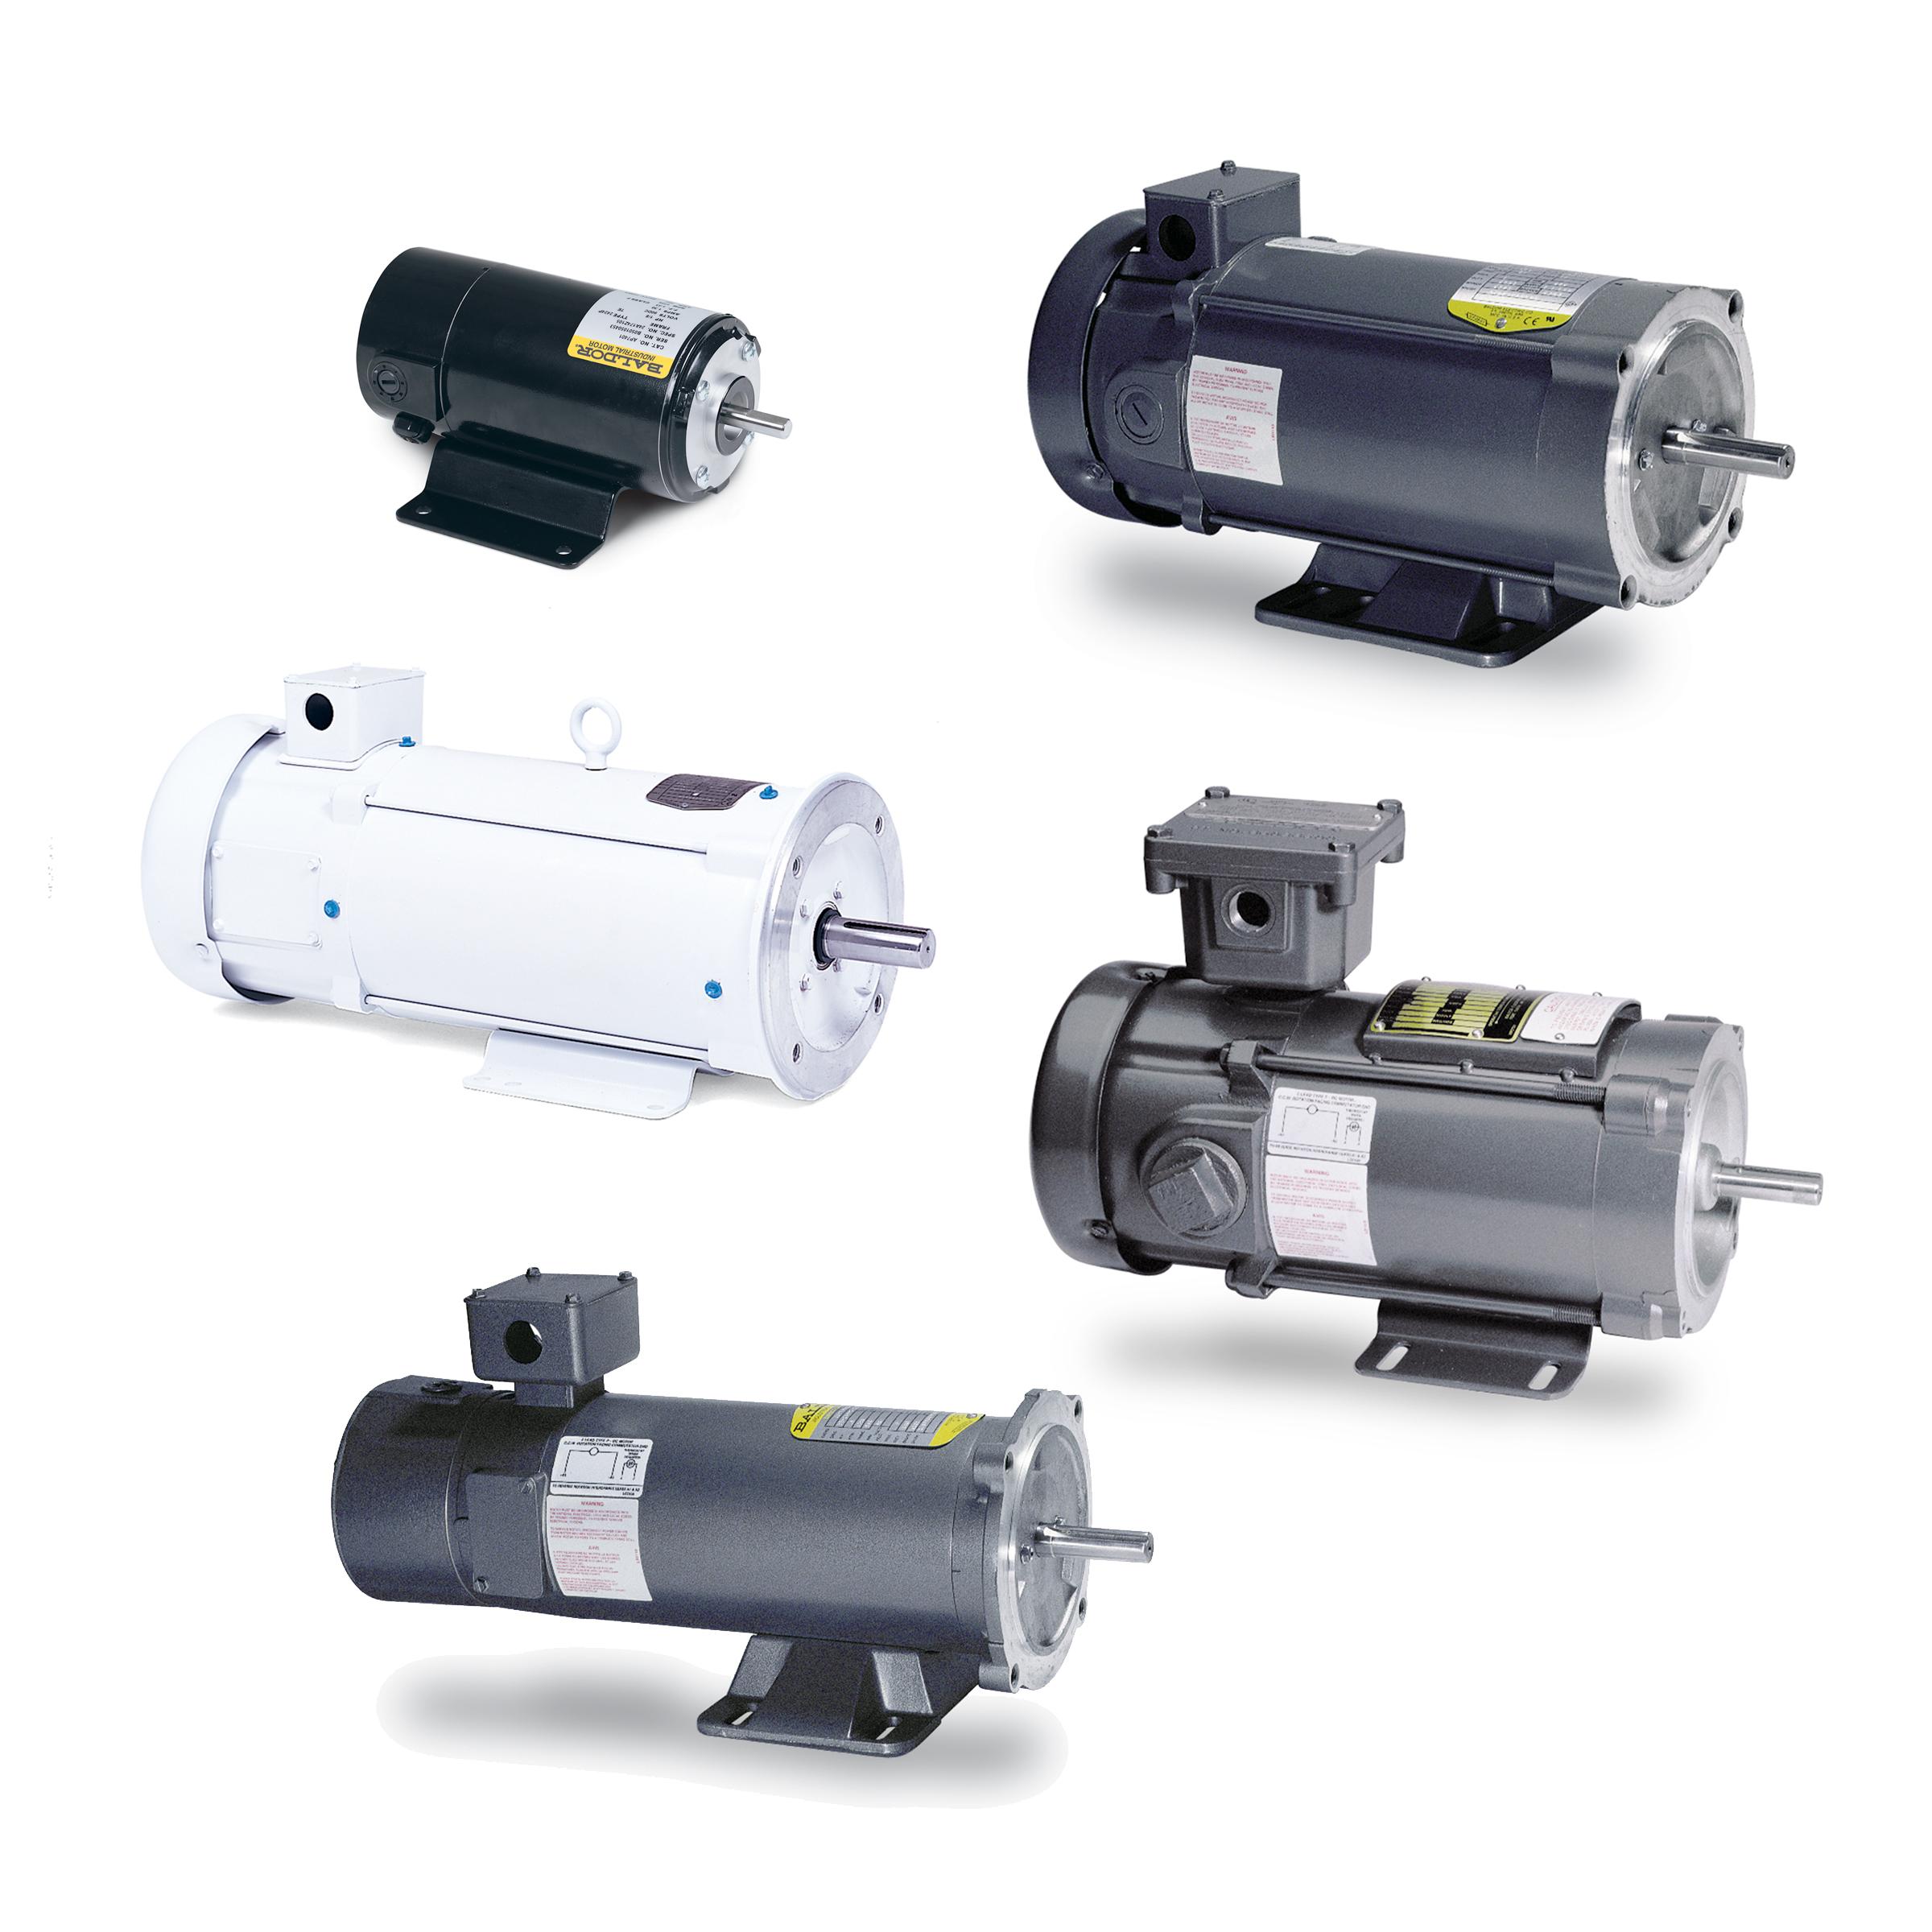 baldor reliance dc permanent magnet motor family.ashx?bc=white&as=1&w=1024 dc motors baldor com baldor dc motor wiring diagram at cos-gaming.co